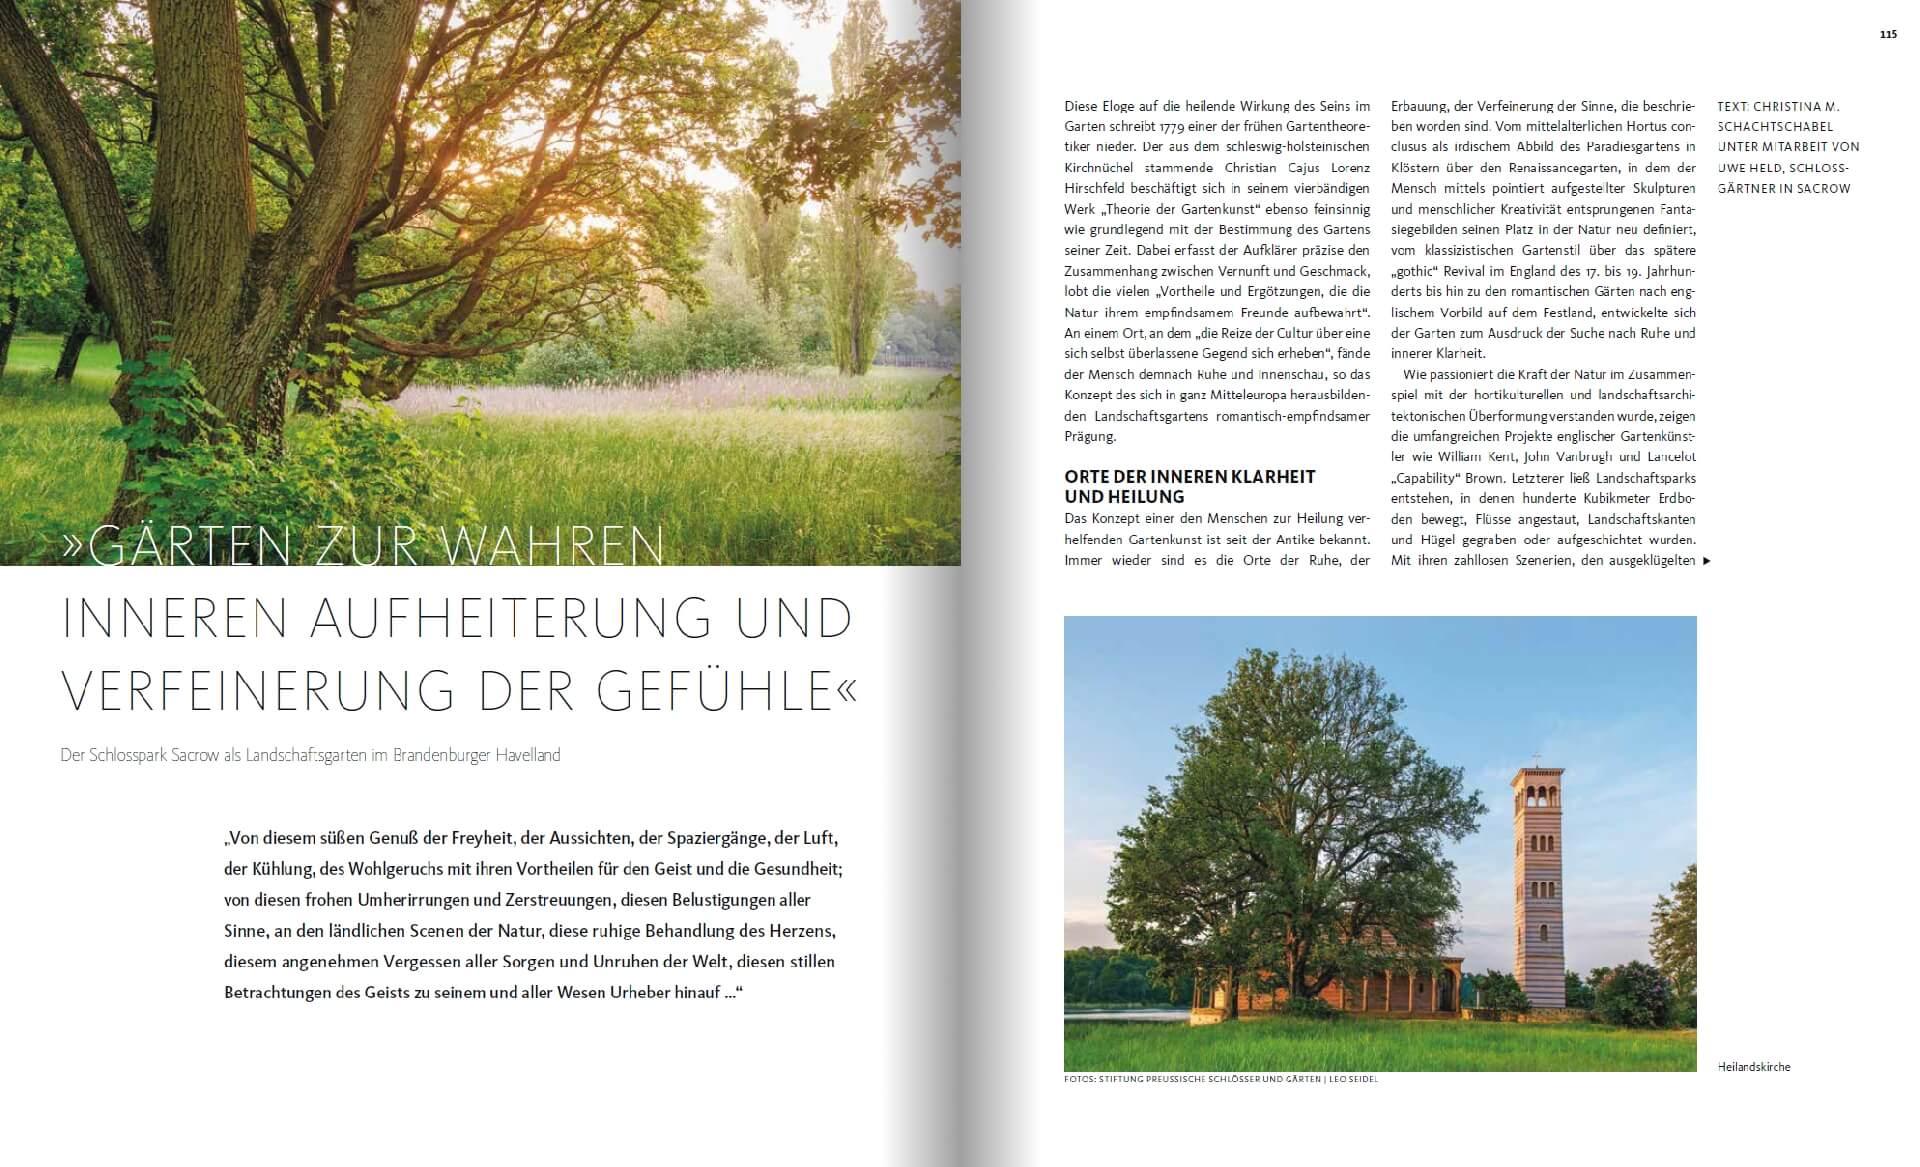 GARTENDESIGN INSPIRATION 4/2018: Schlosspark Sacrow